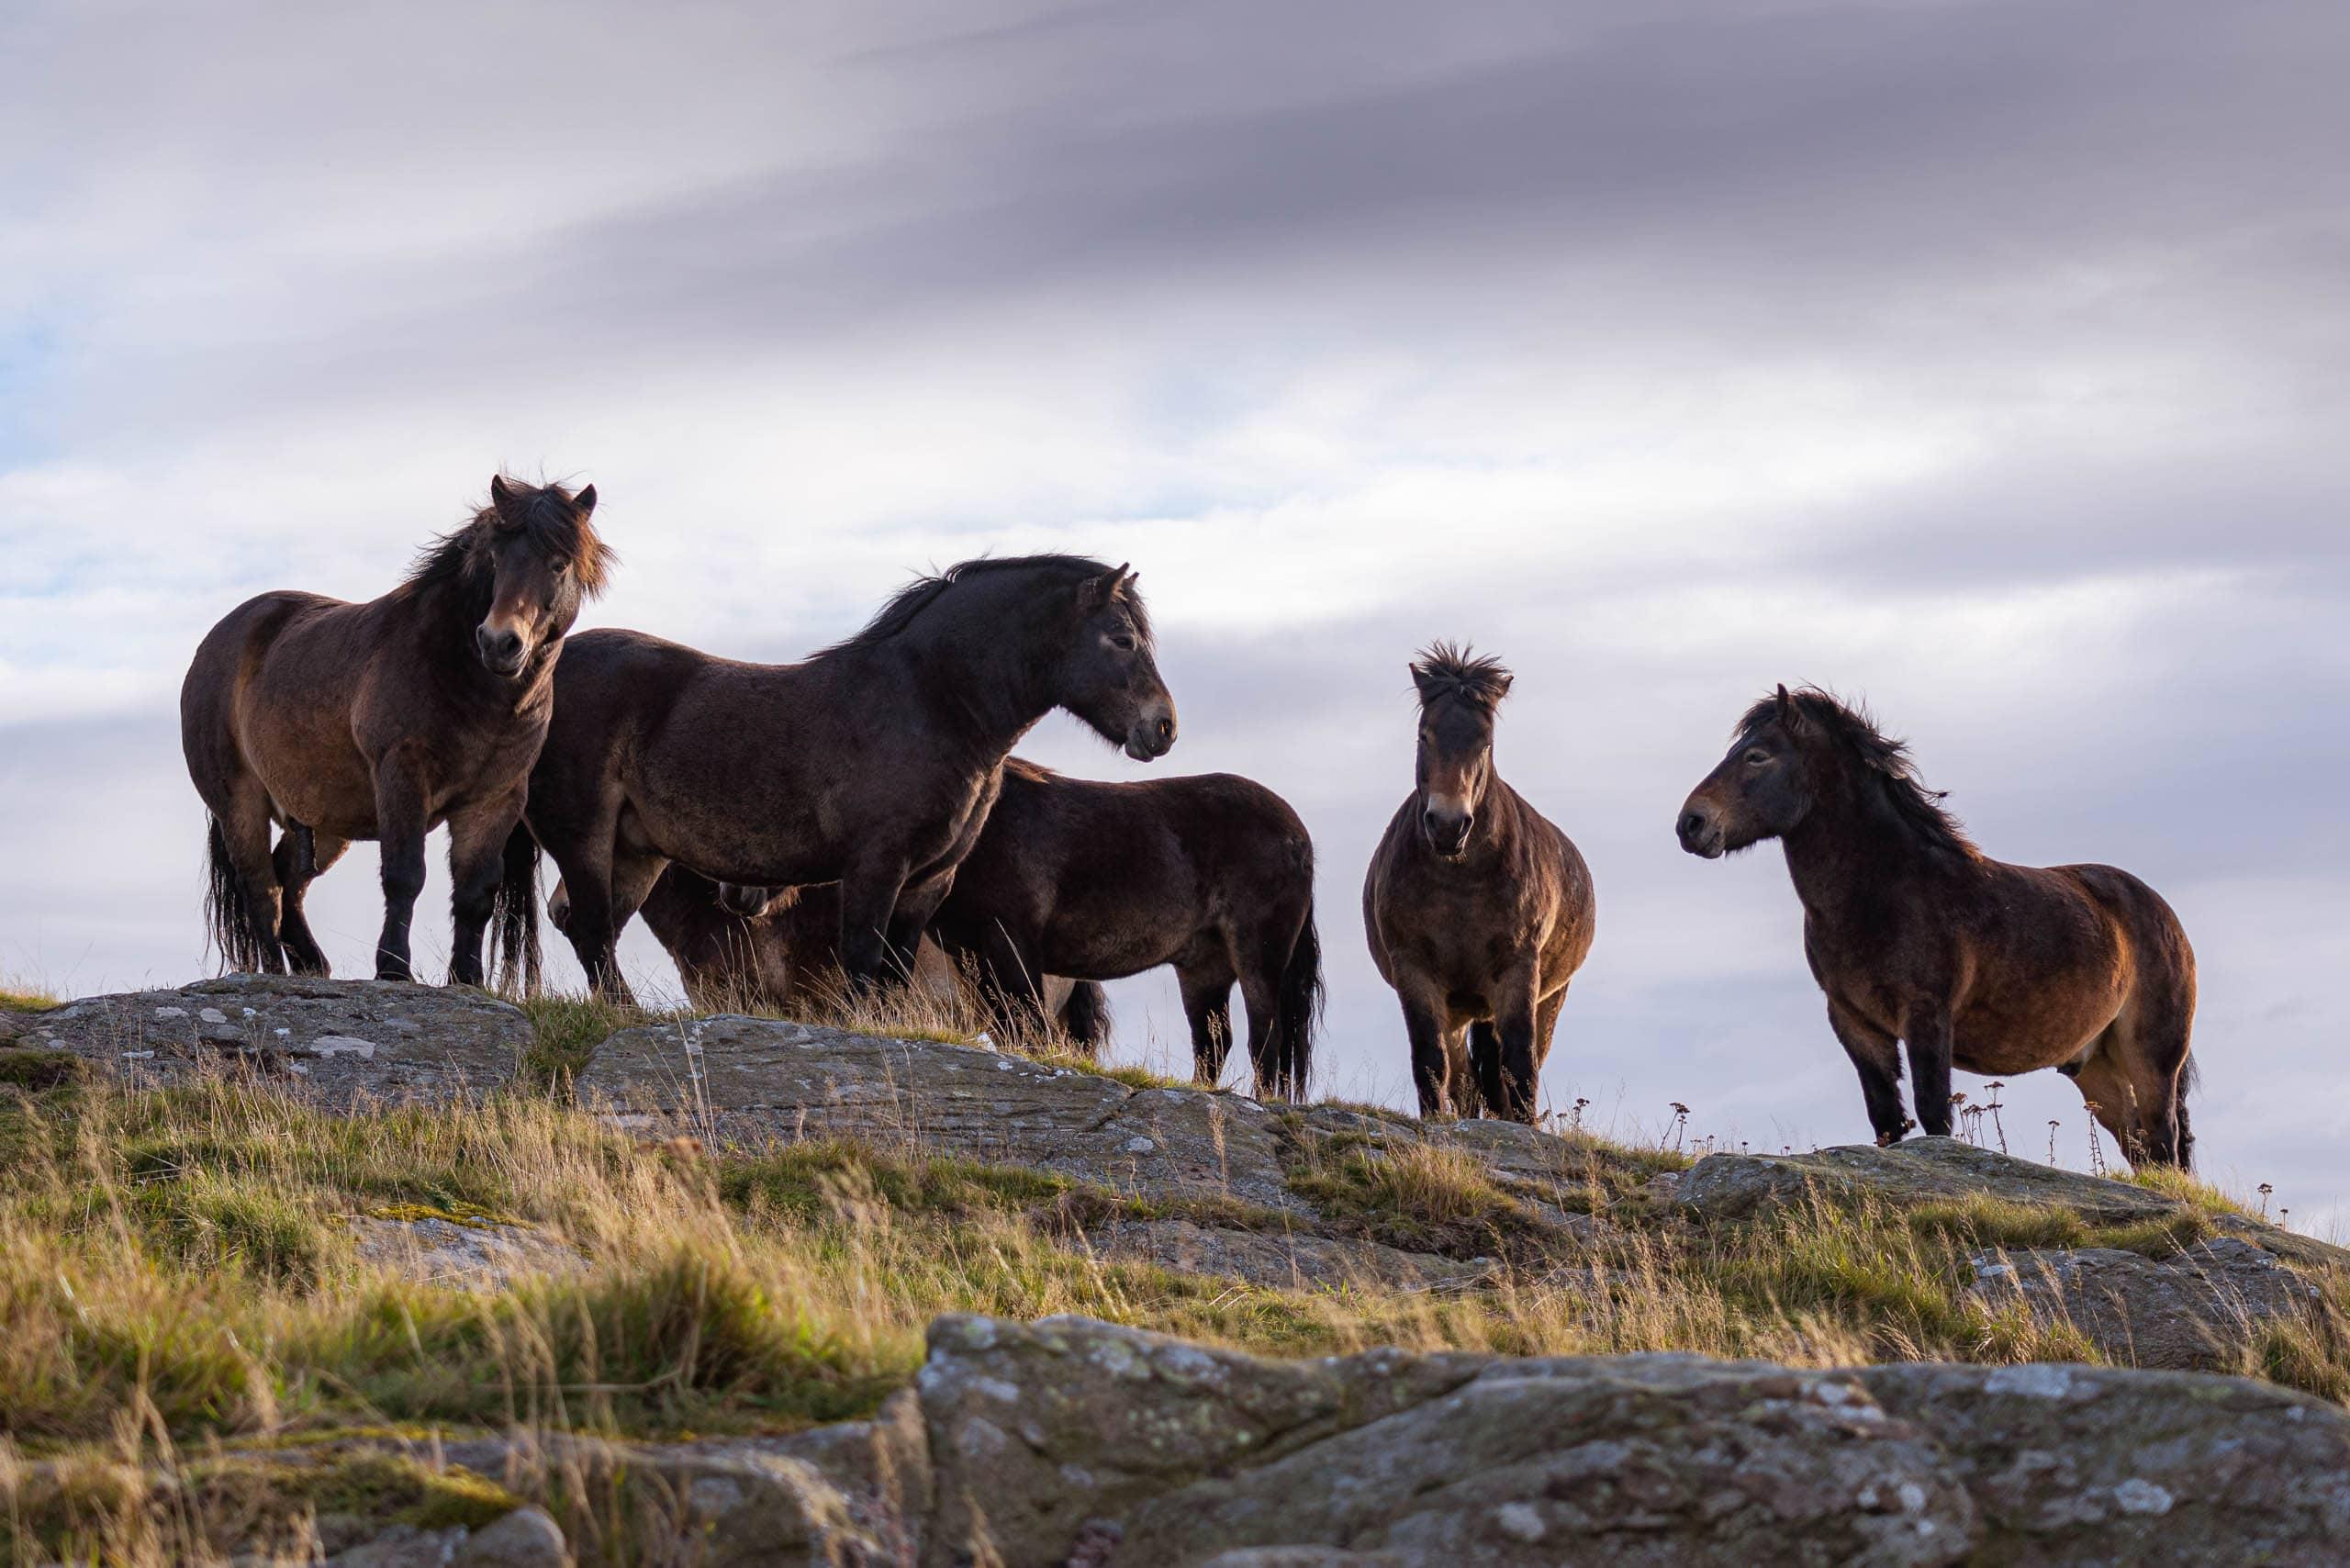 Horses on North Berwick Law | f/4 1/640sec ISO-100 57mm  | ILCE-7RM3